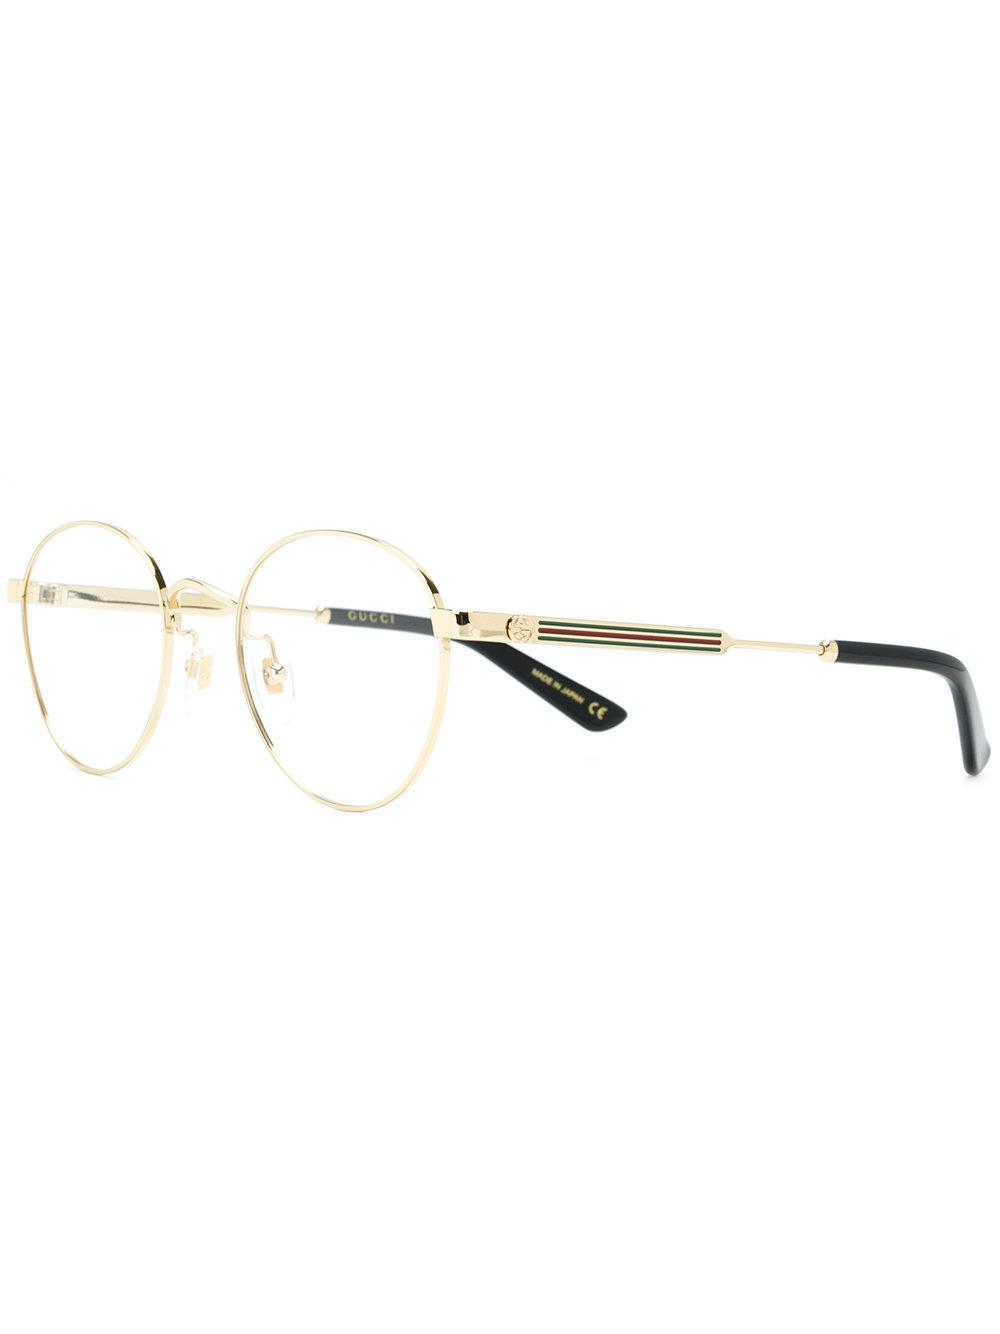 10b07eae028da Gucci Round Glasses in Metallic for Men - Lyst